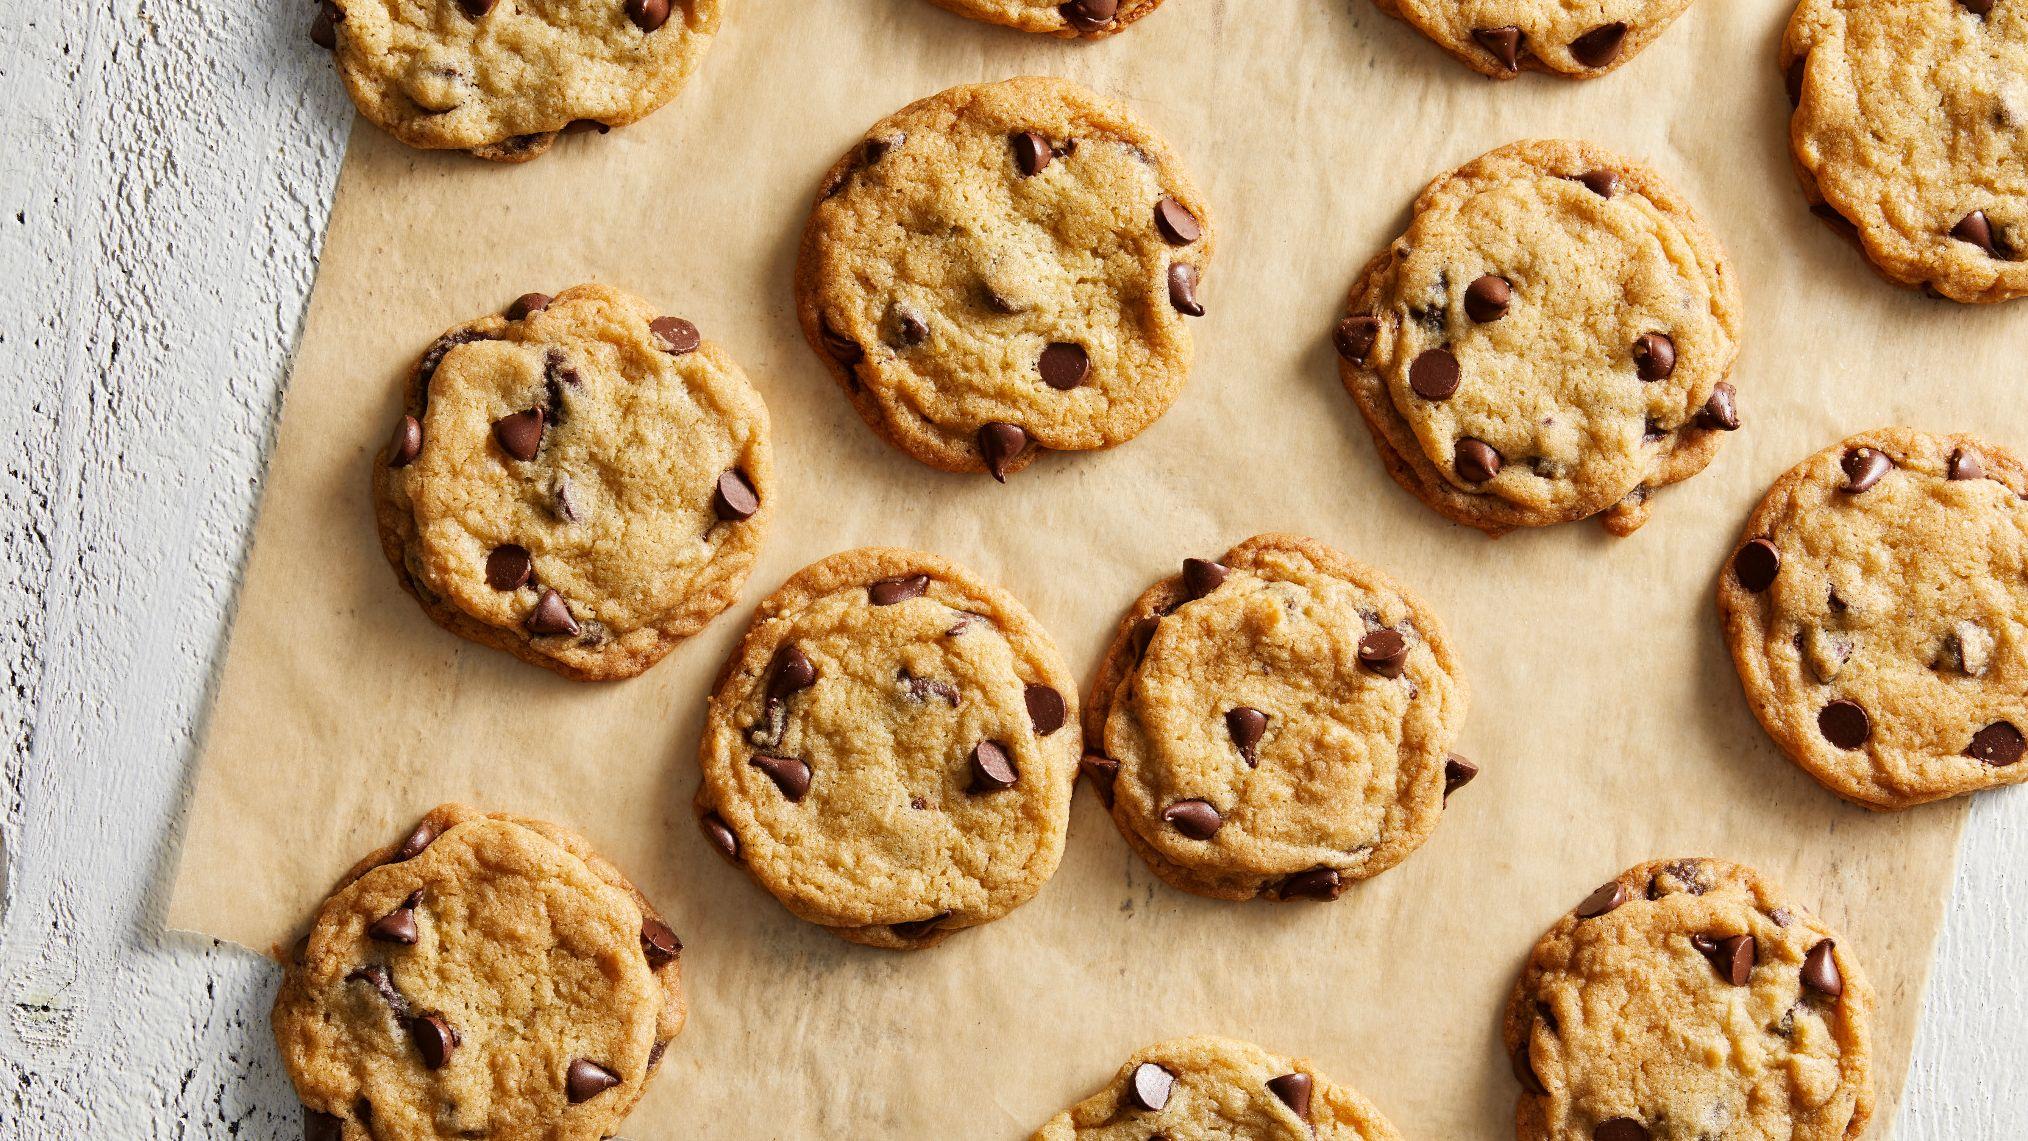 Vanilla_rich_chocolate_chip_cookies_004.jpg